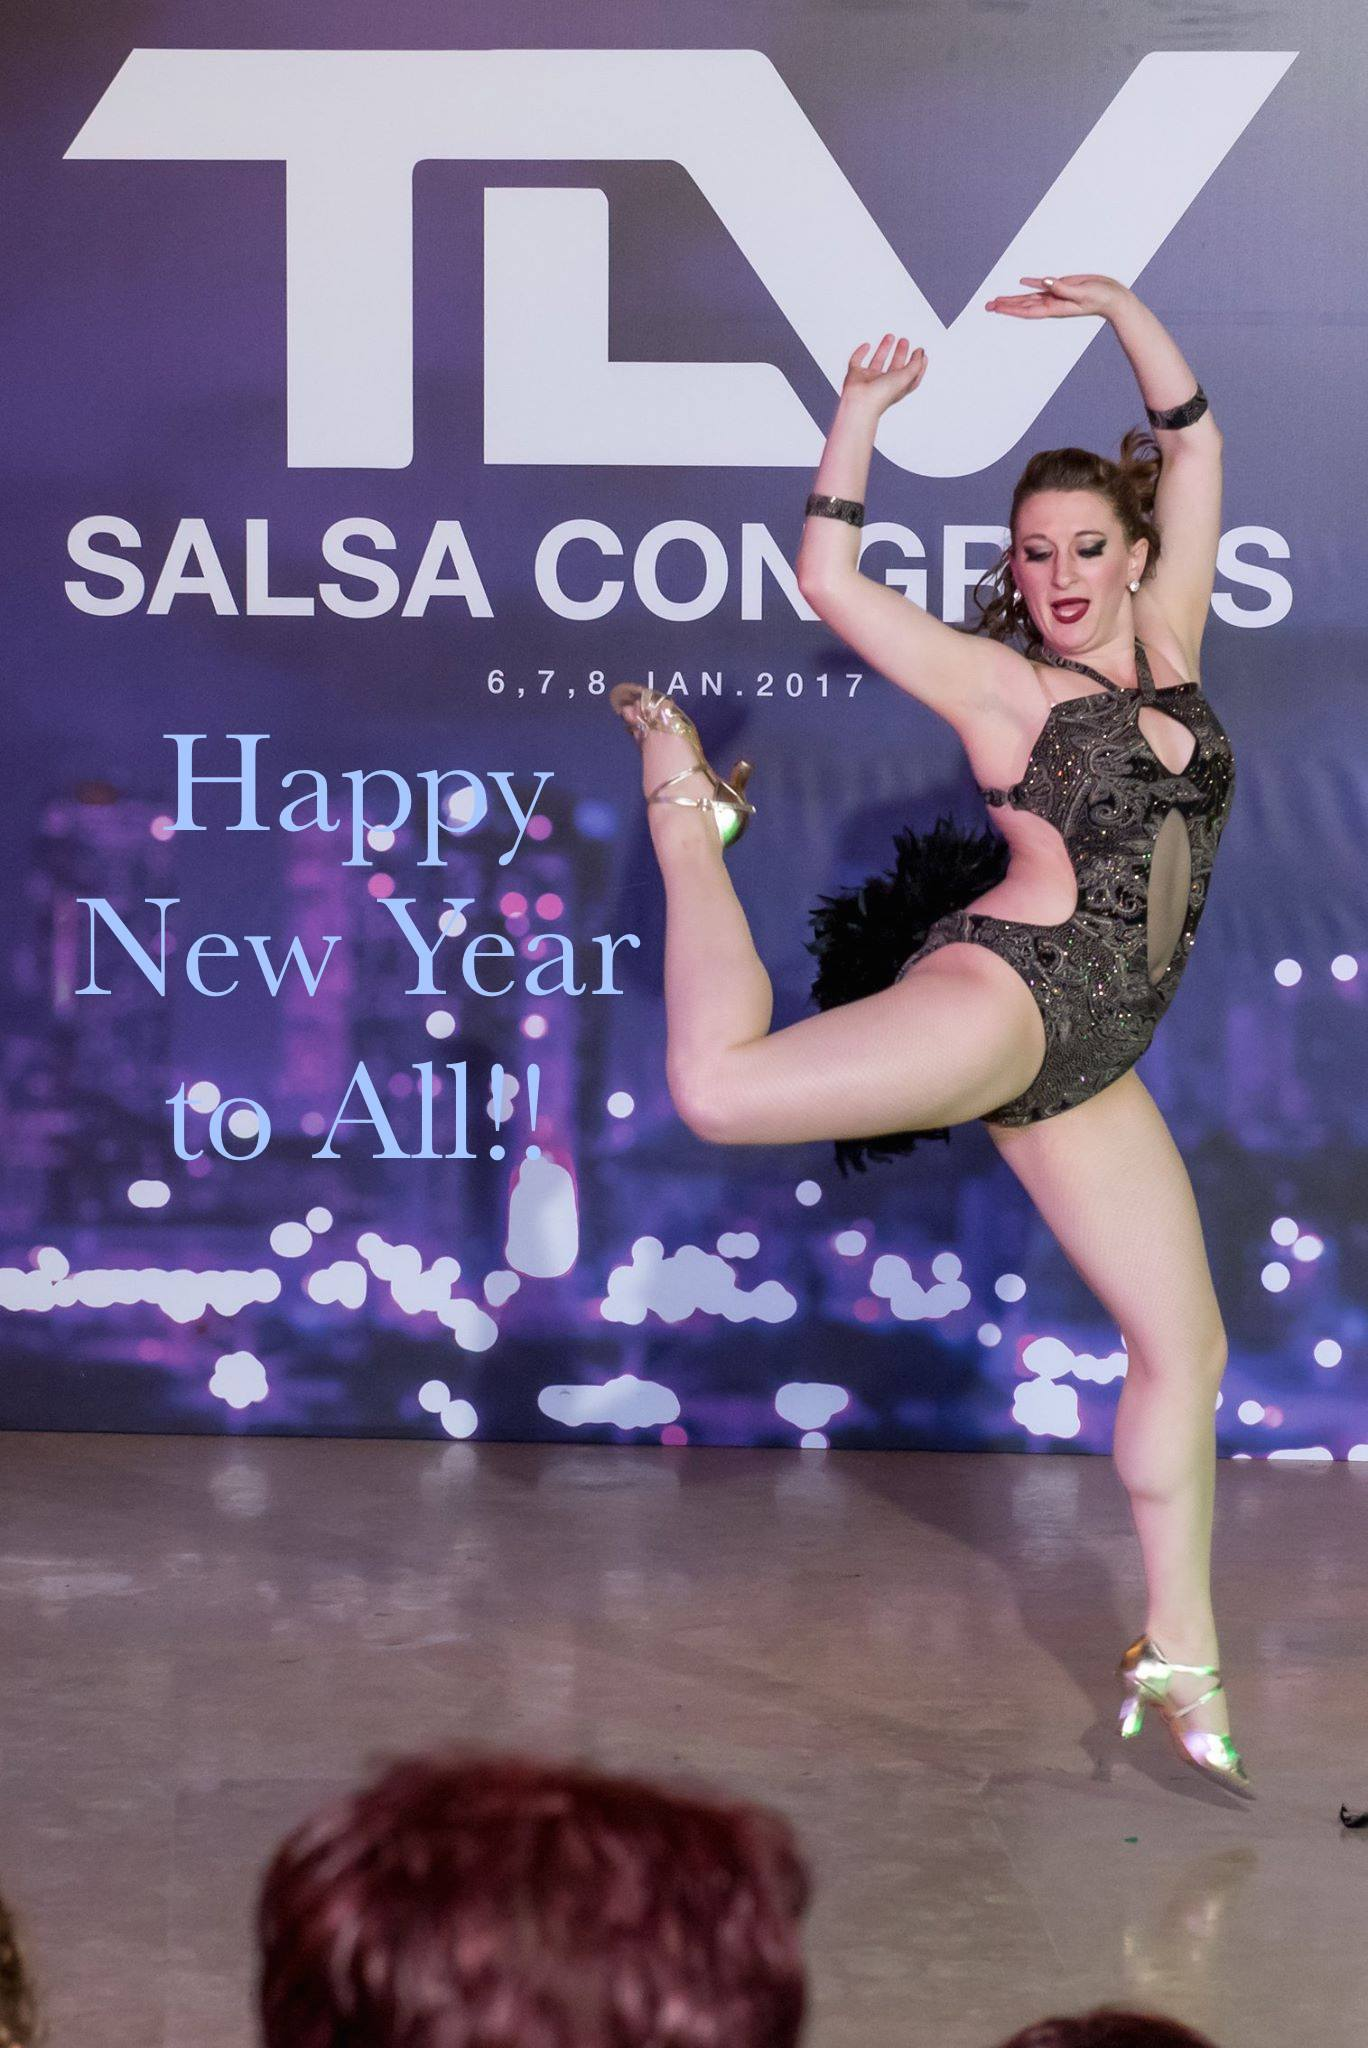 tlv salsa jump happy new year.jpg